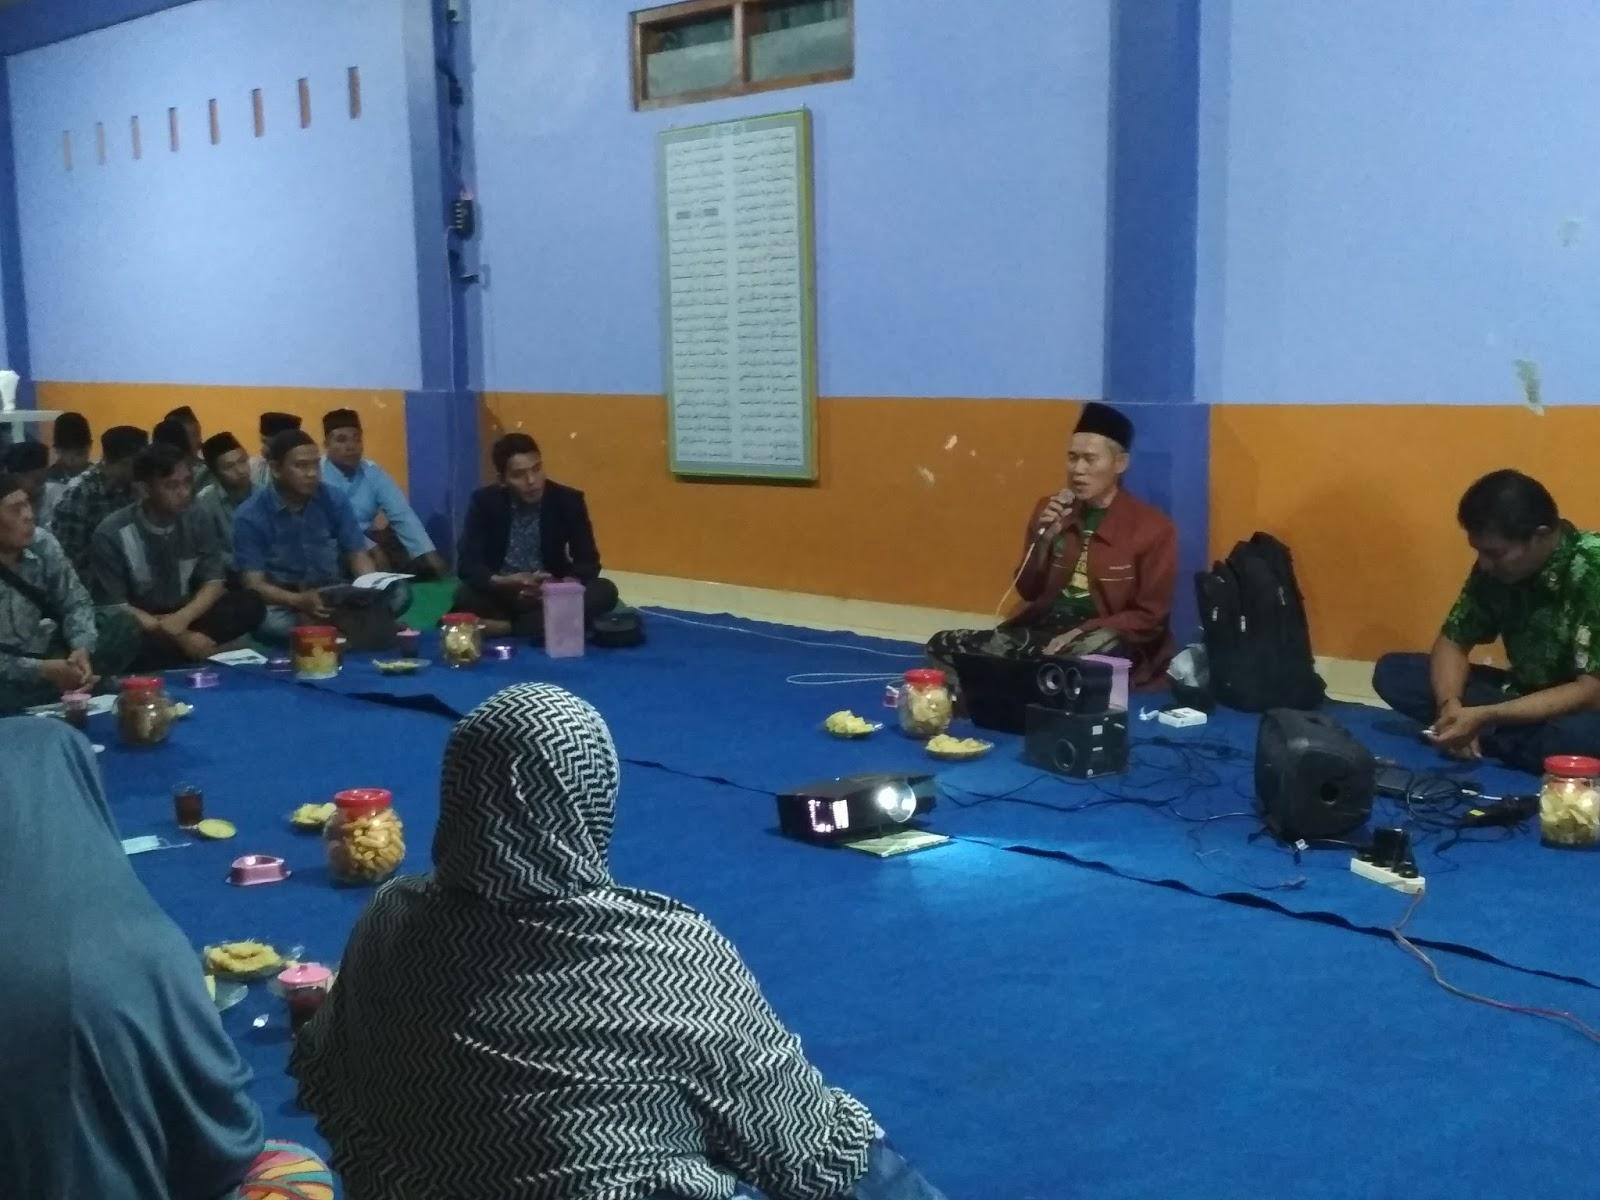 Headline Report Tasyakur 1 Tahun Stokis Rokok Sin Jogja Provost Jaksel Herbal Tsi News Pada Tanggal 14 Oktober 2017 Diadakan Acara Menyapa Dan Menebar Manfaat Di Provinsi Yogyakarta Kegiatan